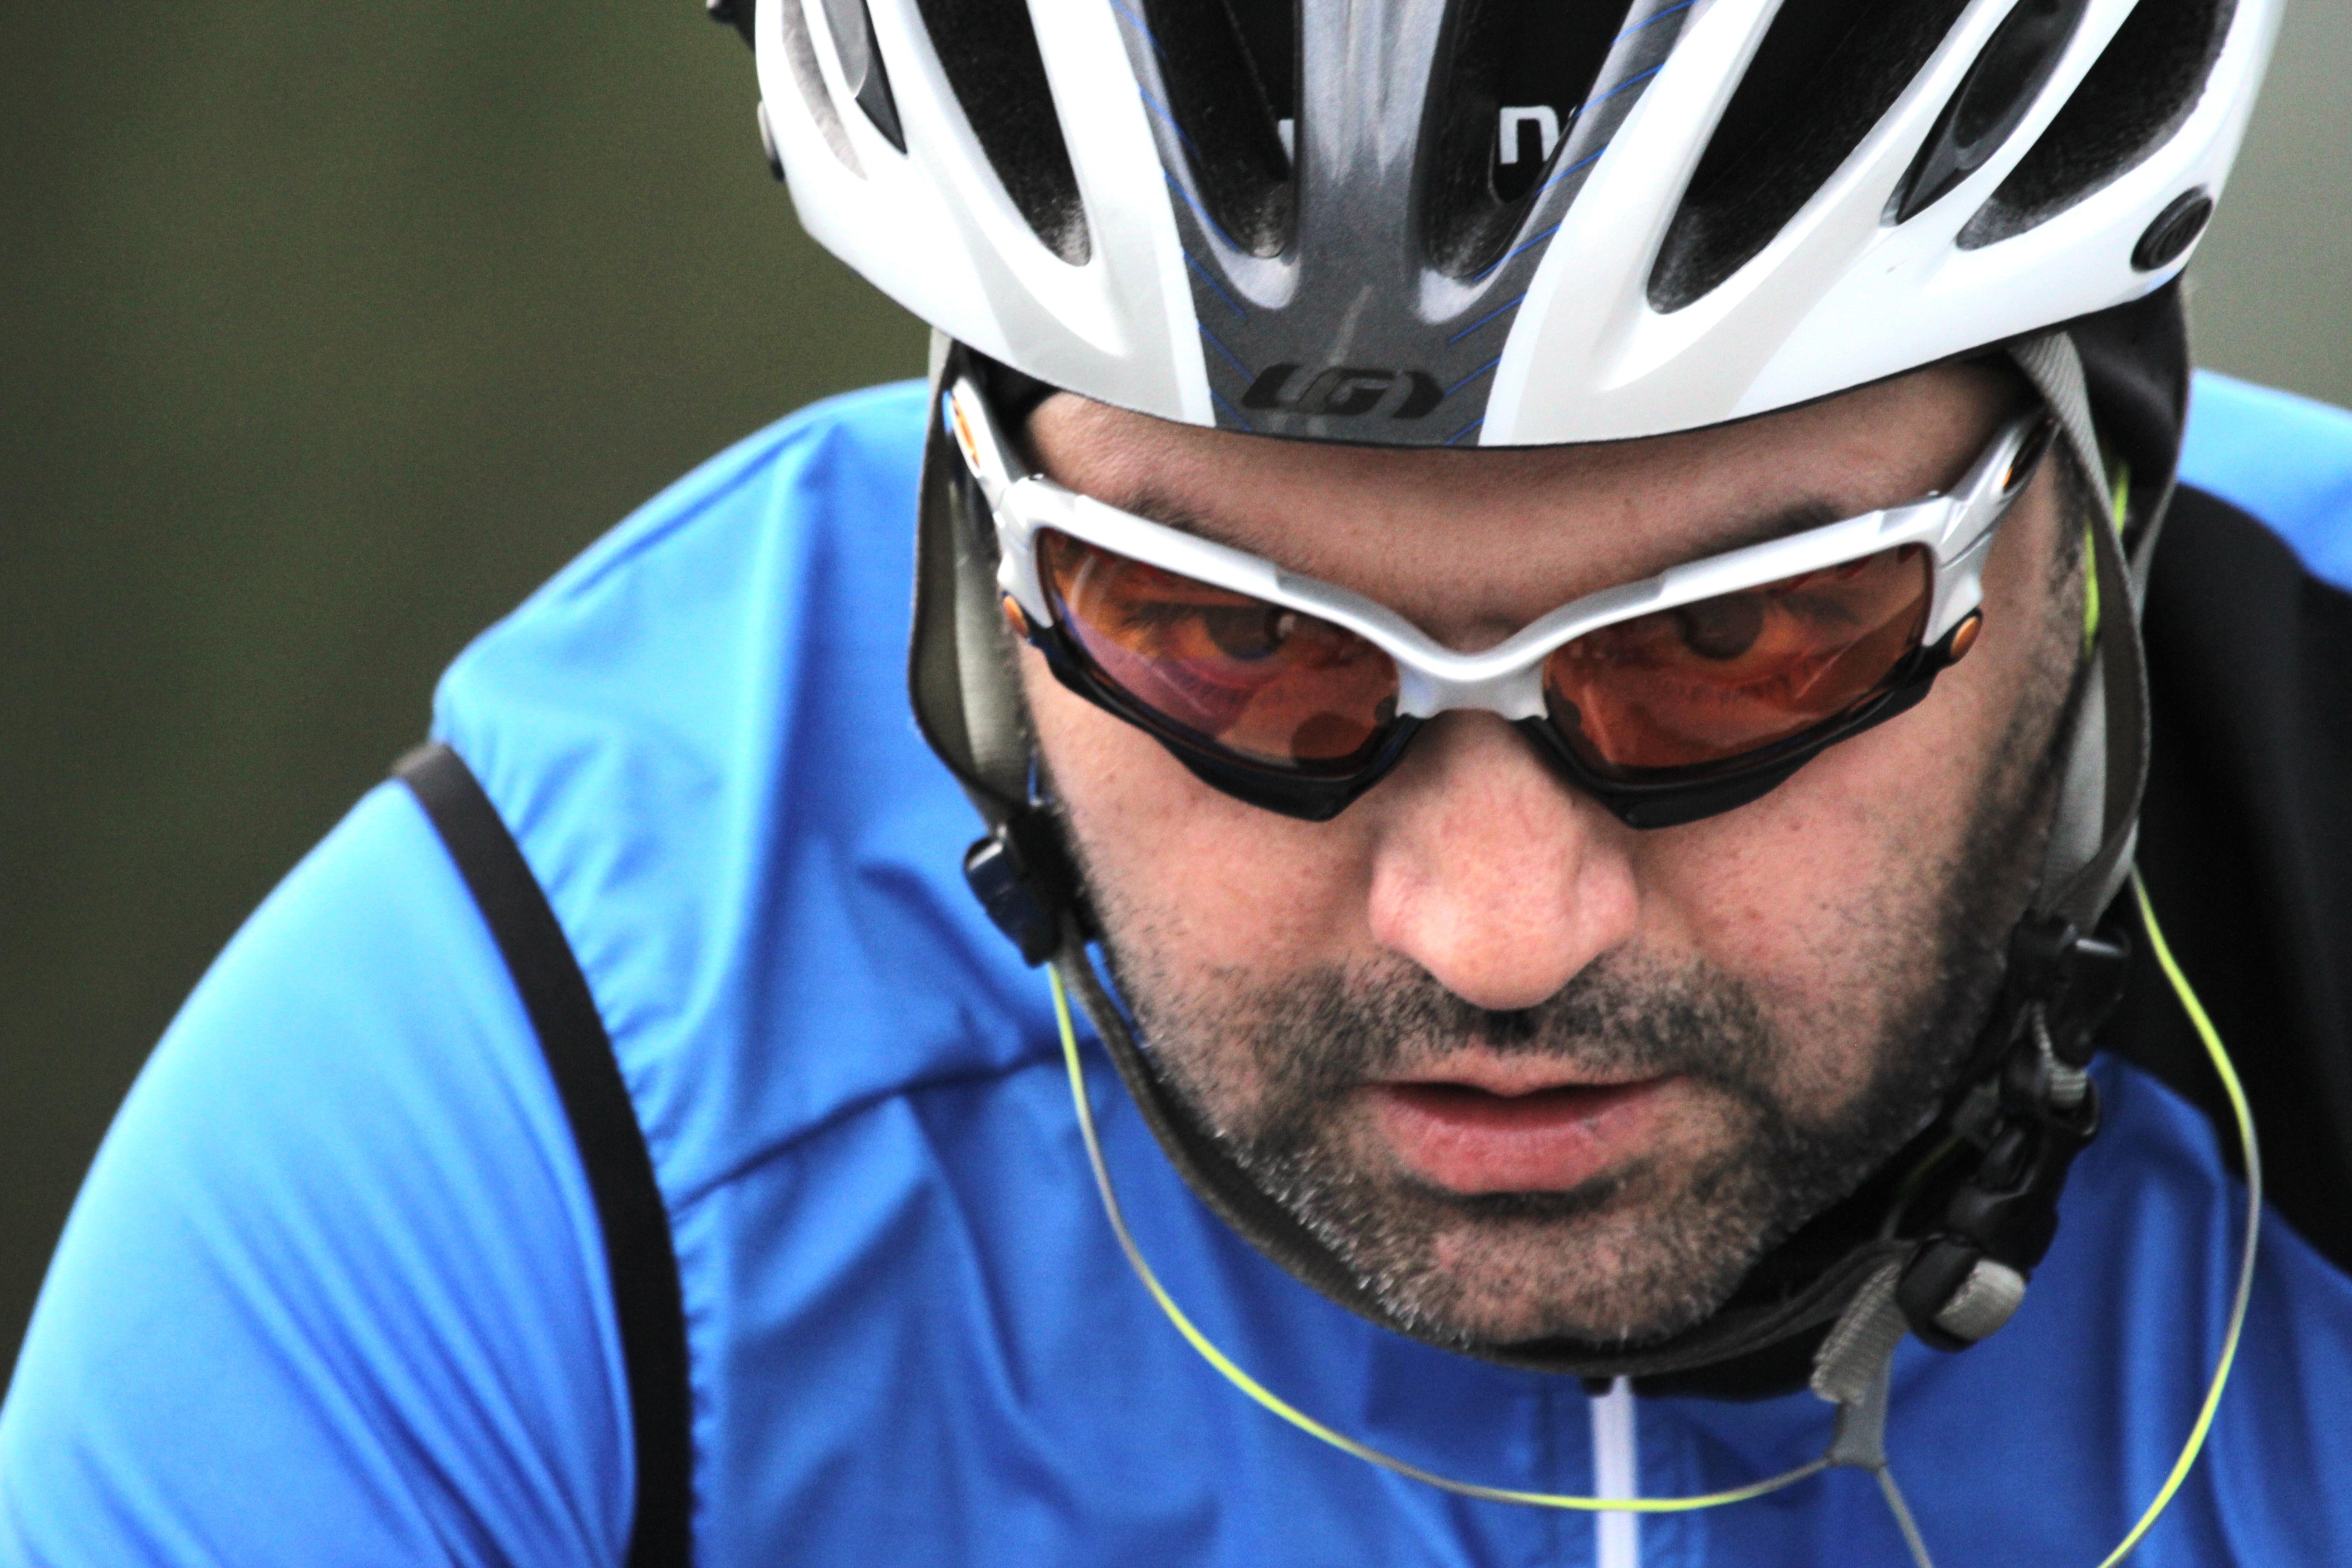 Reza headshot determined look